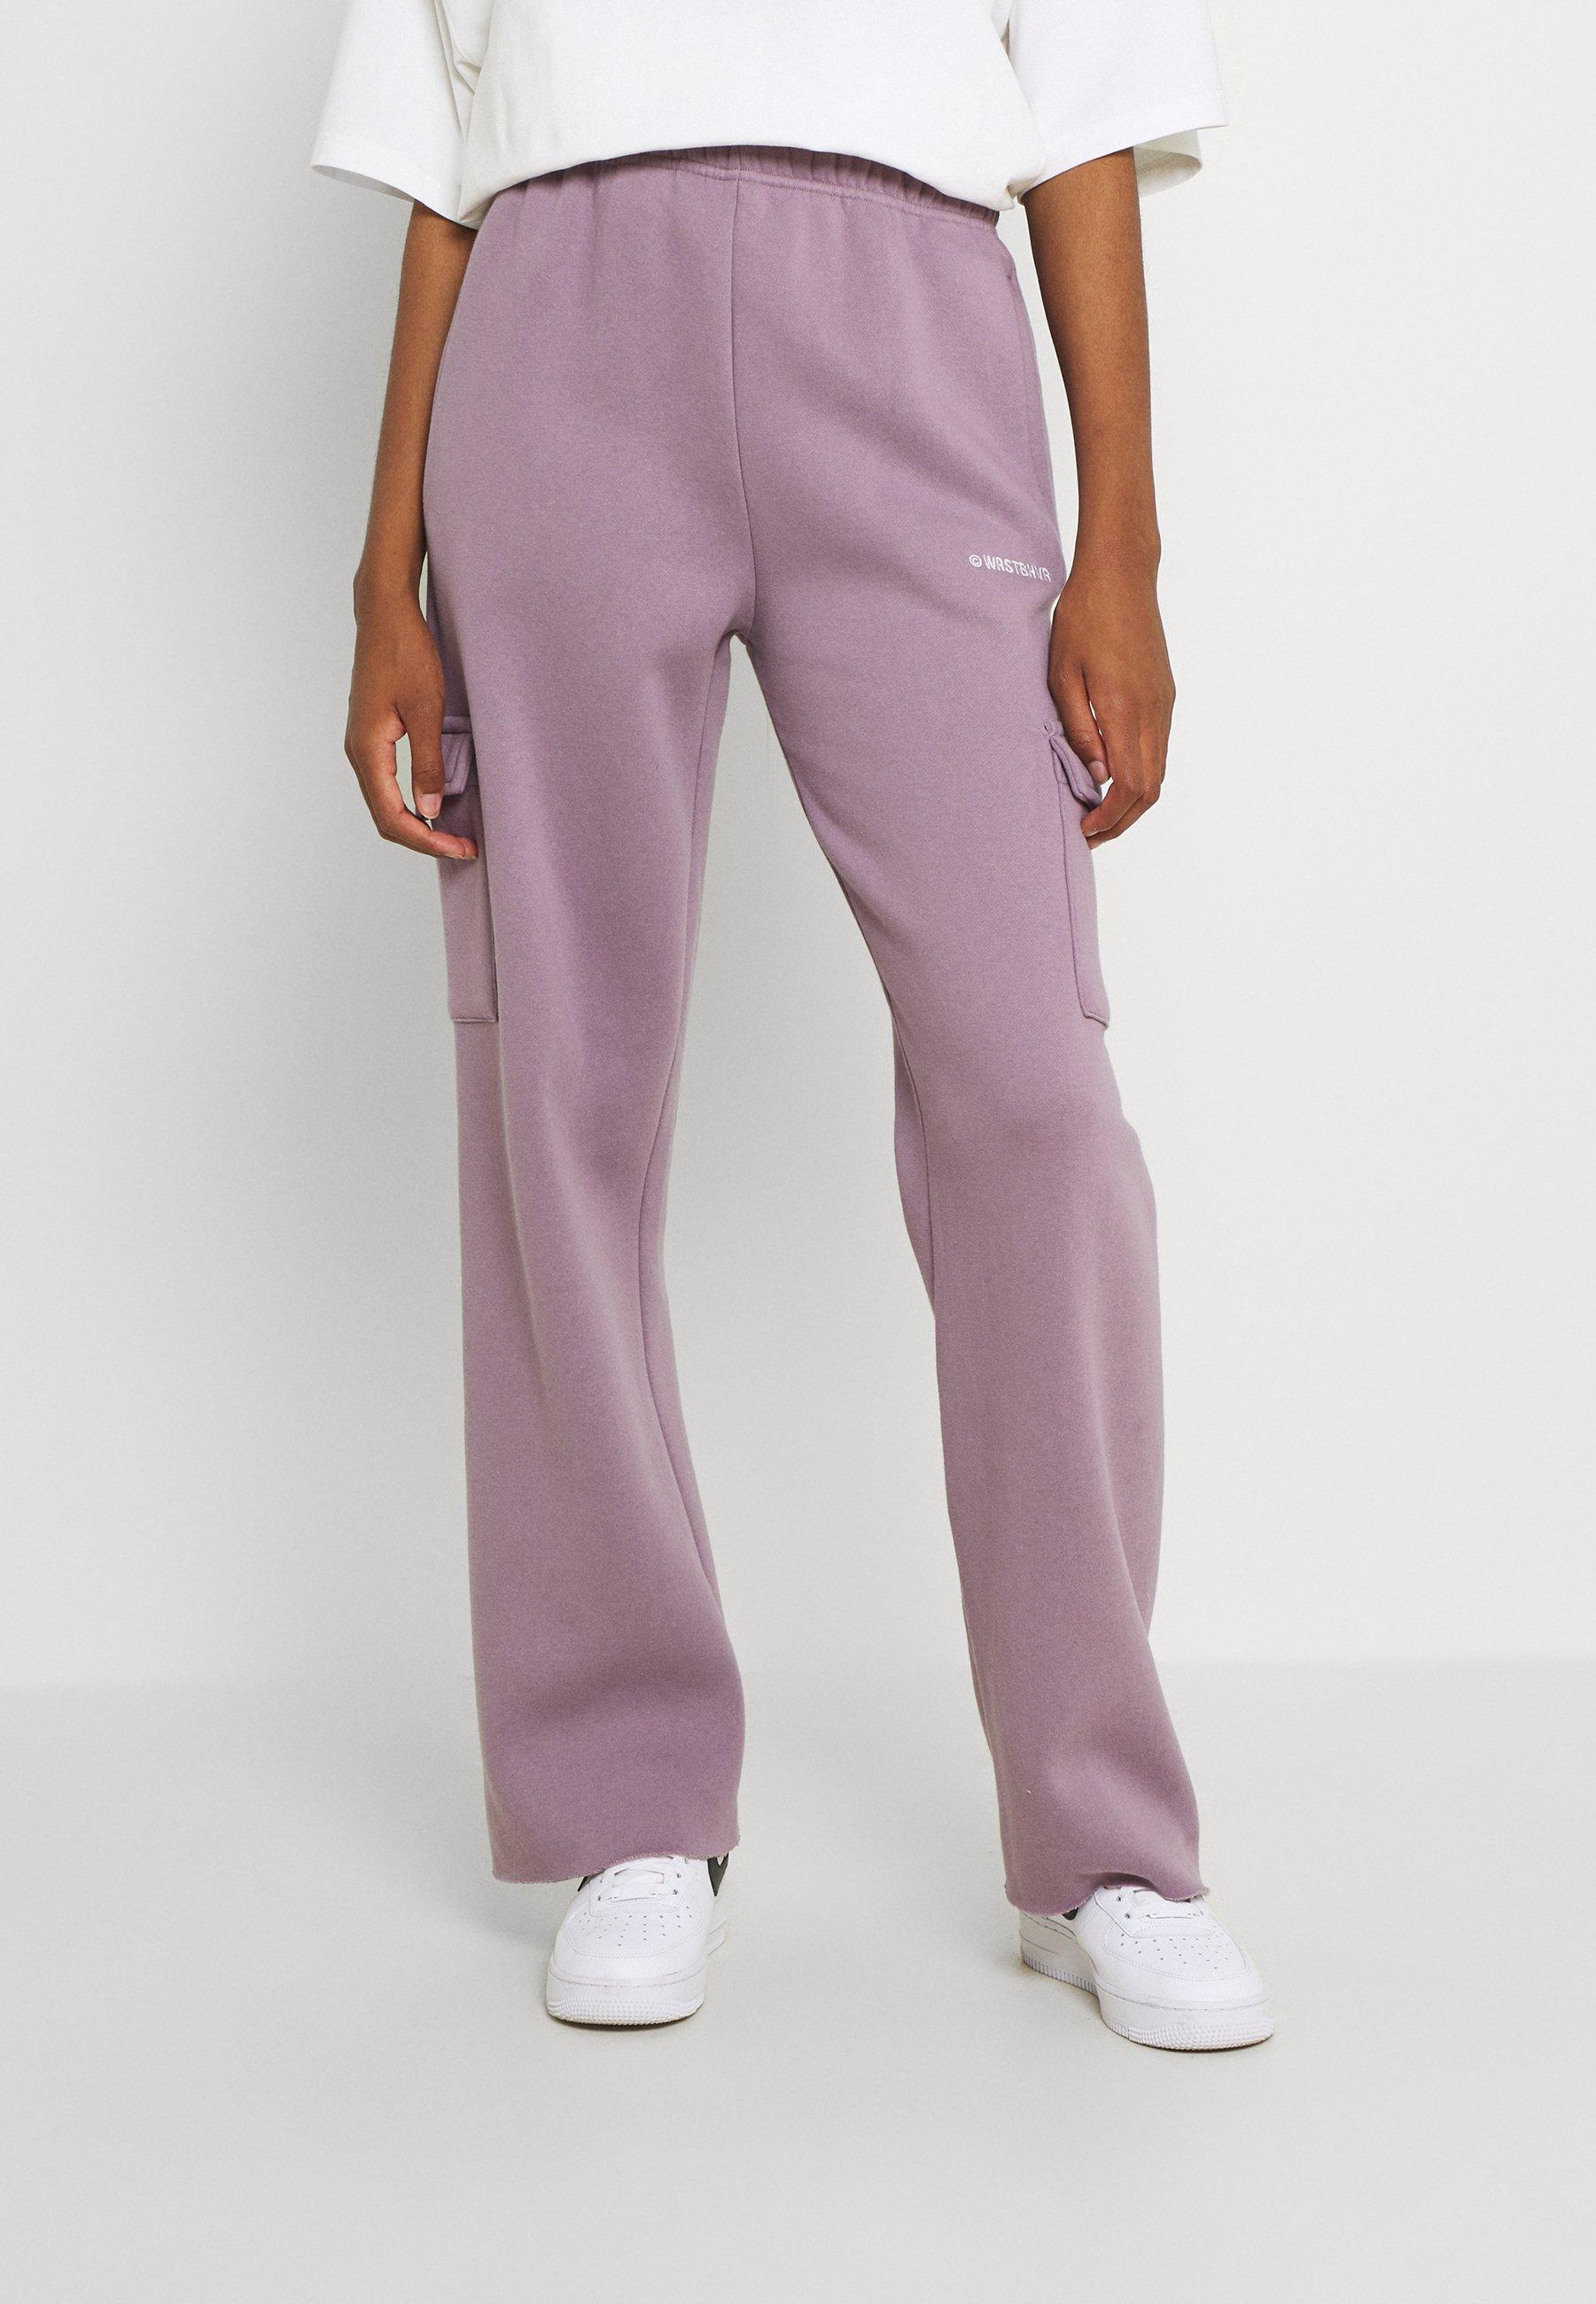 Women GATY PANTS STONE LILAC WOMEN - Cargo trousers